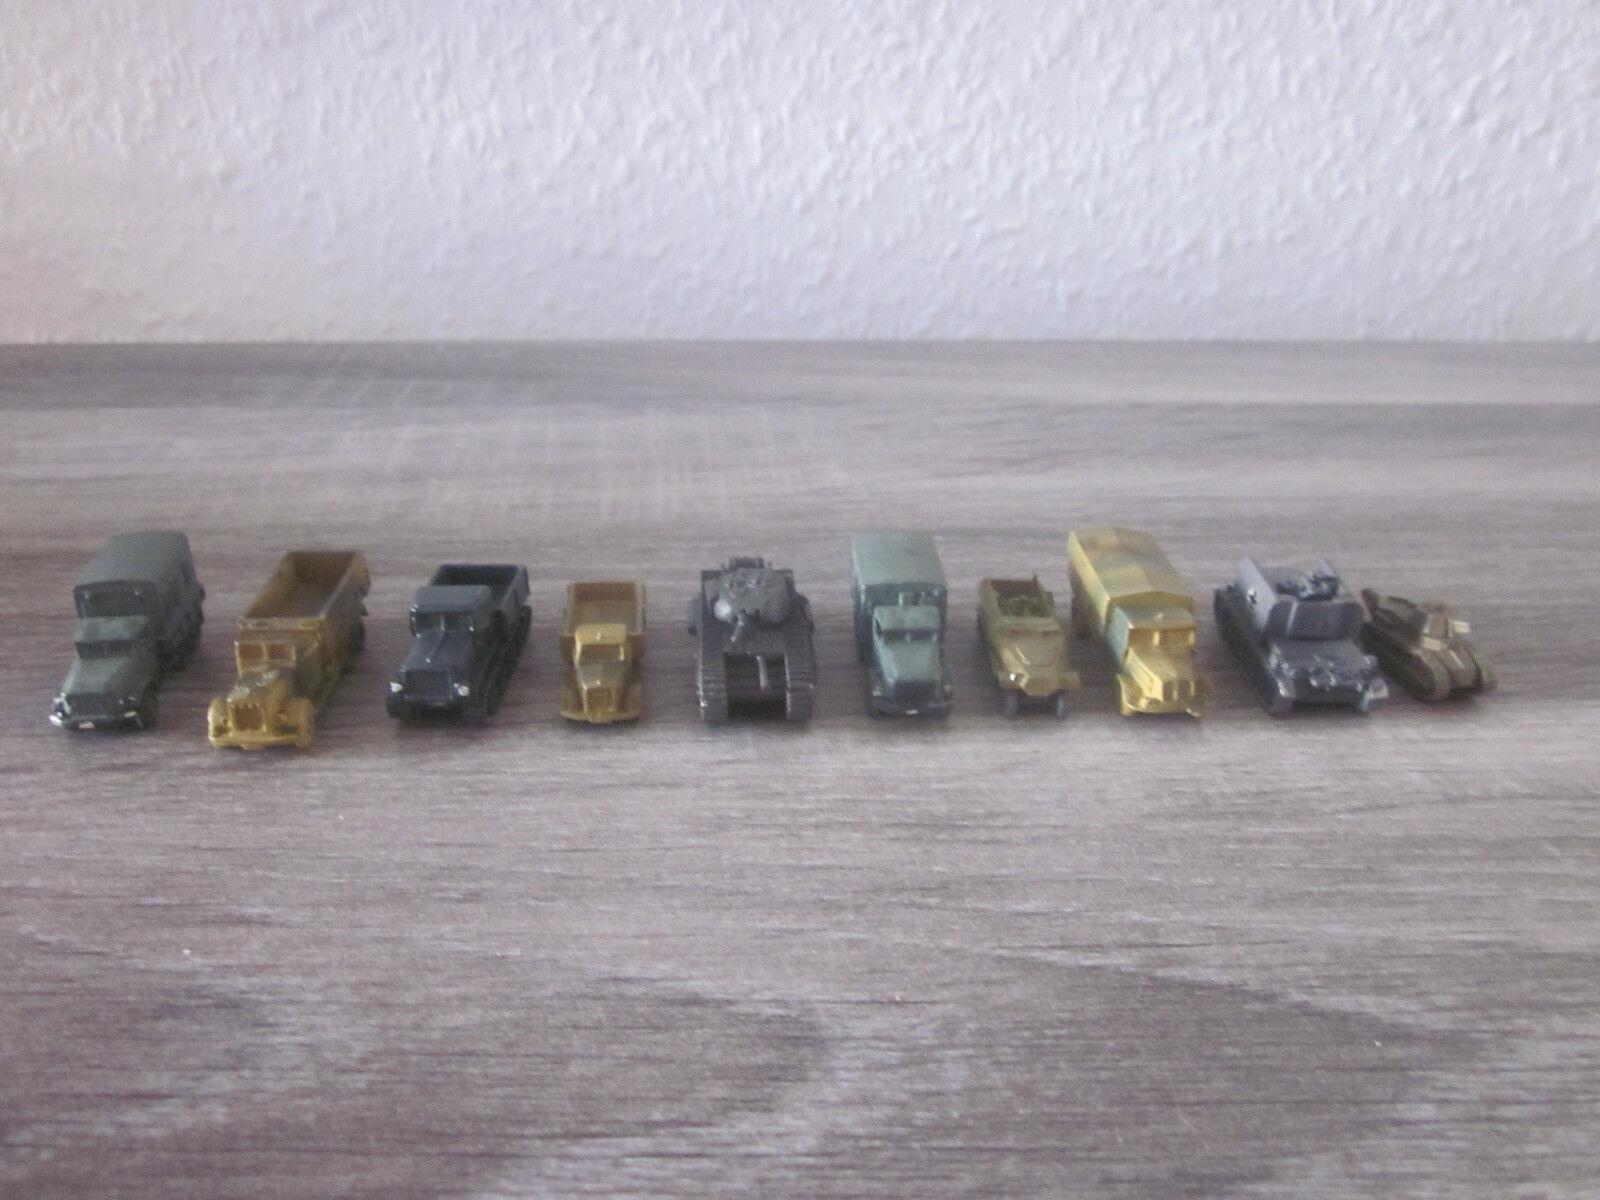 10 X Diversos Militar Vehículos 2. II Guerra Mundial Escala  N